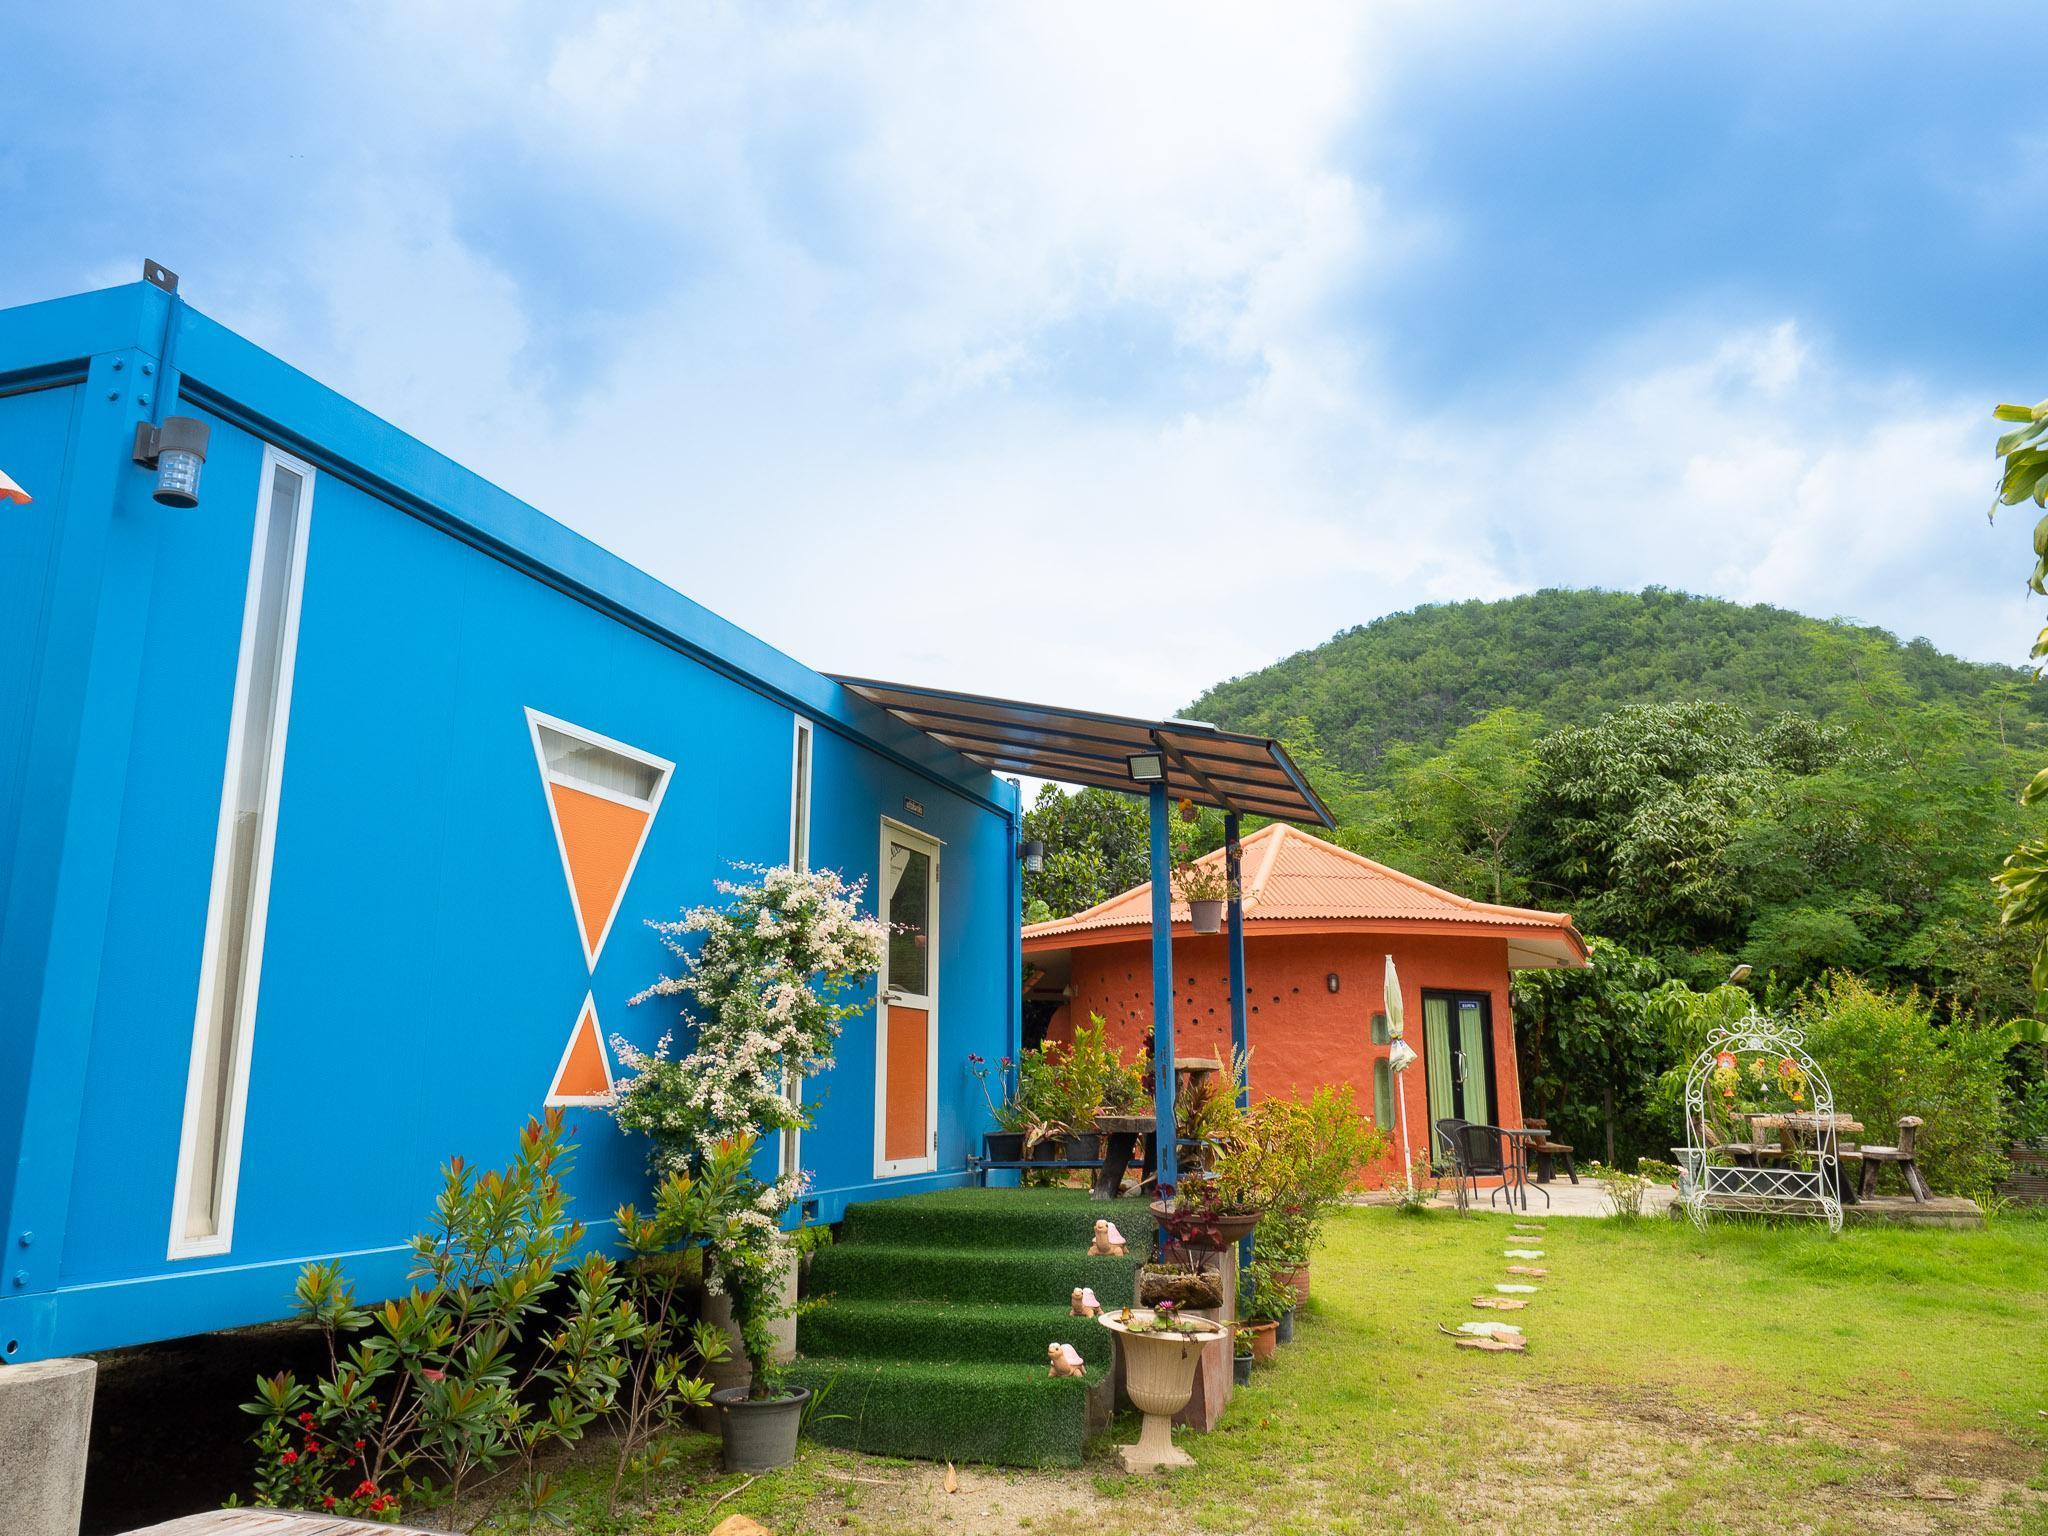 Fineday Khao Yai Resort